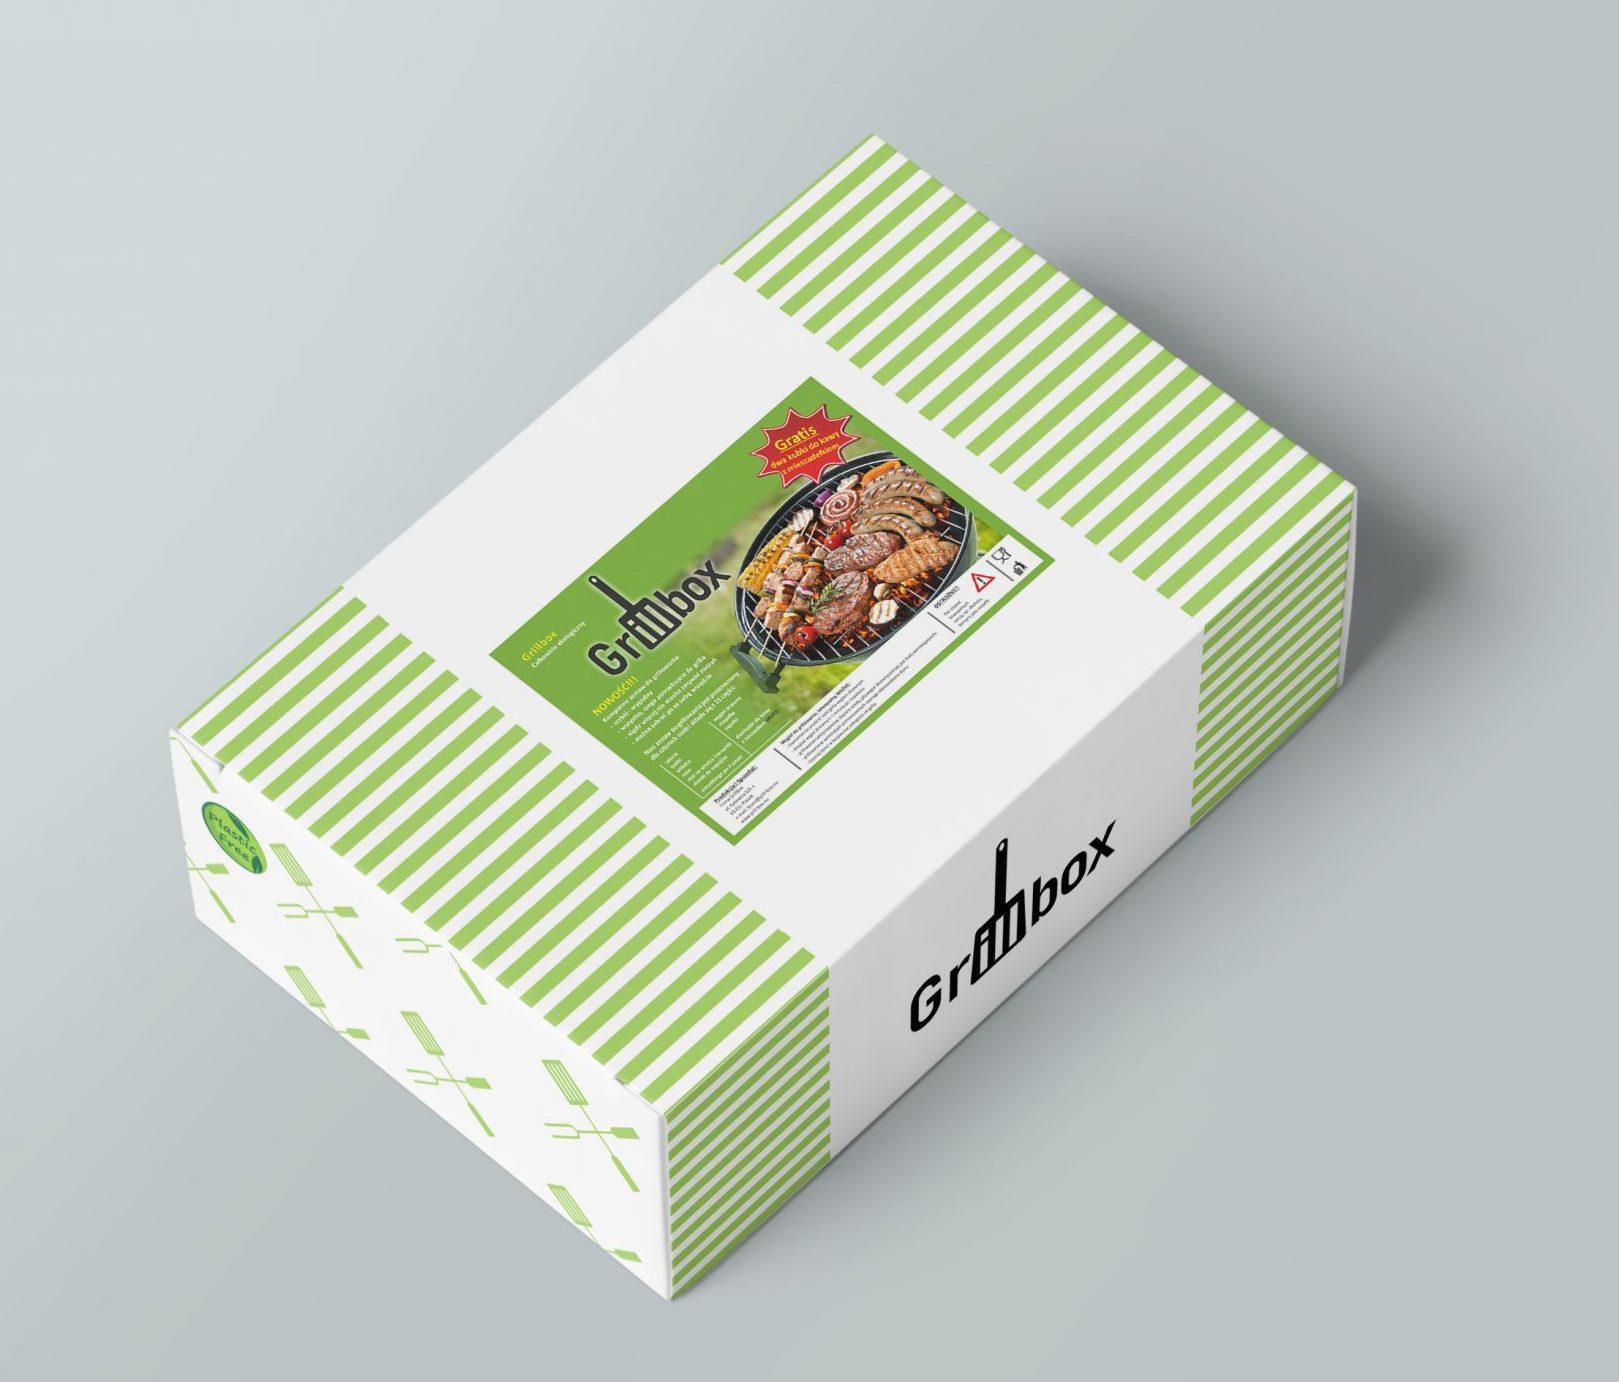 Grill-box